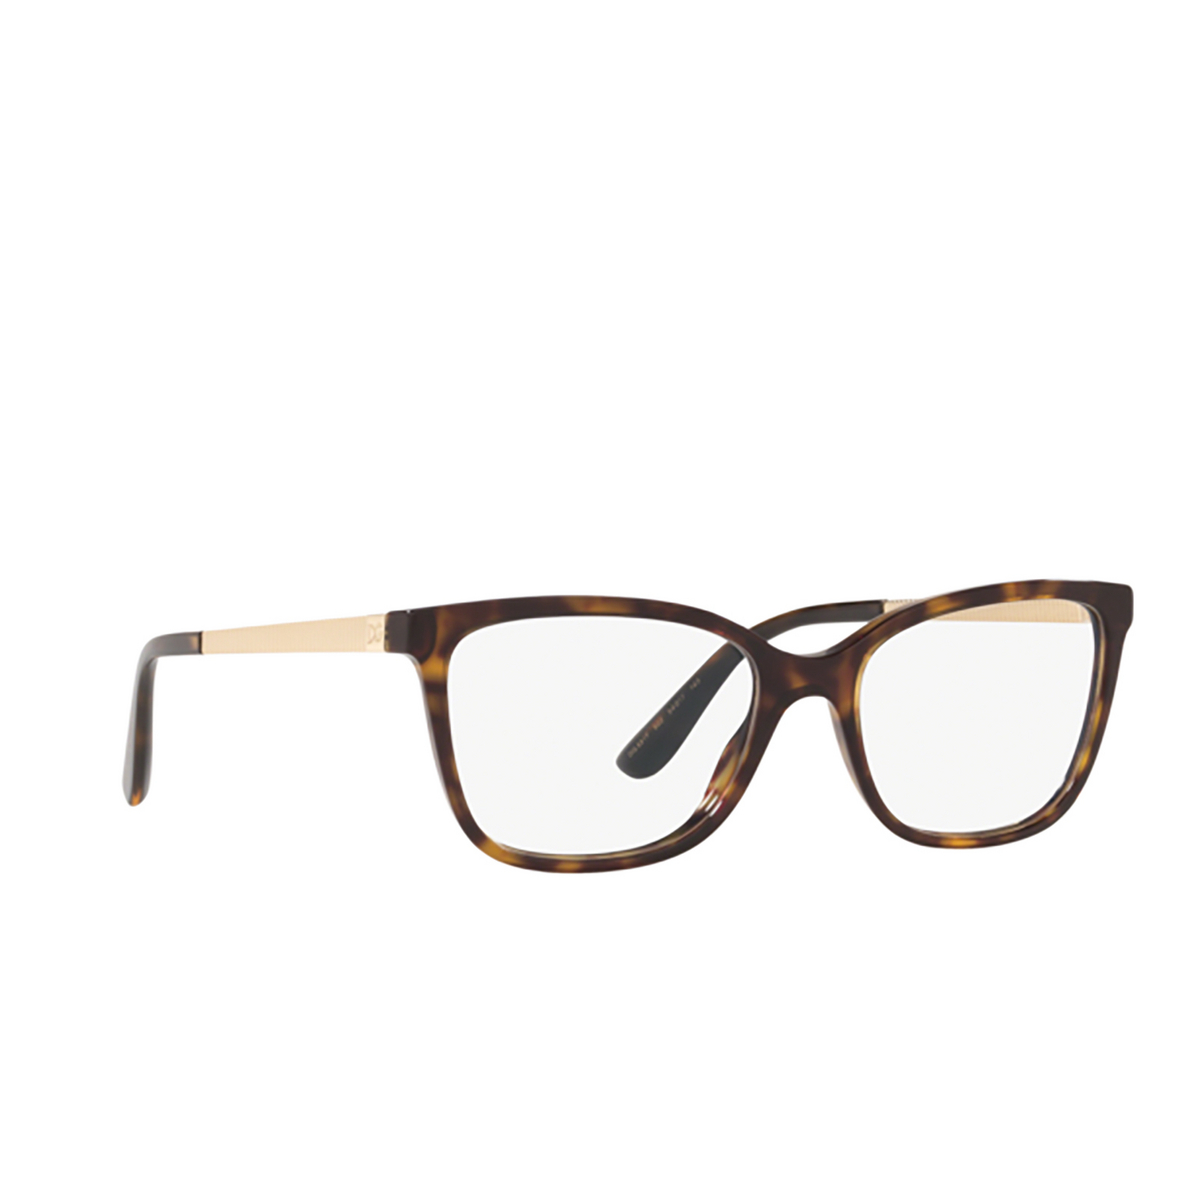 Dolce & Gabbana® Rectangle Eyeglasses: DG3317 color Havana 502 - three-quarters view.